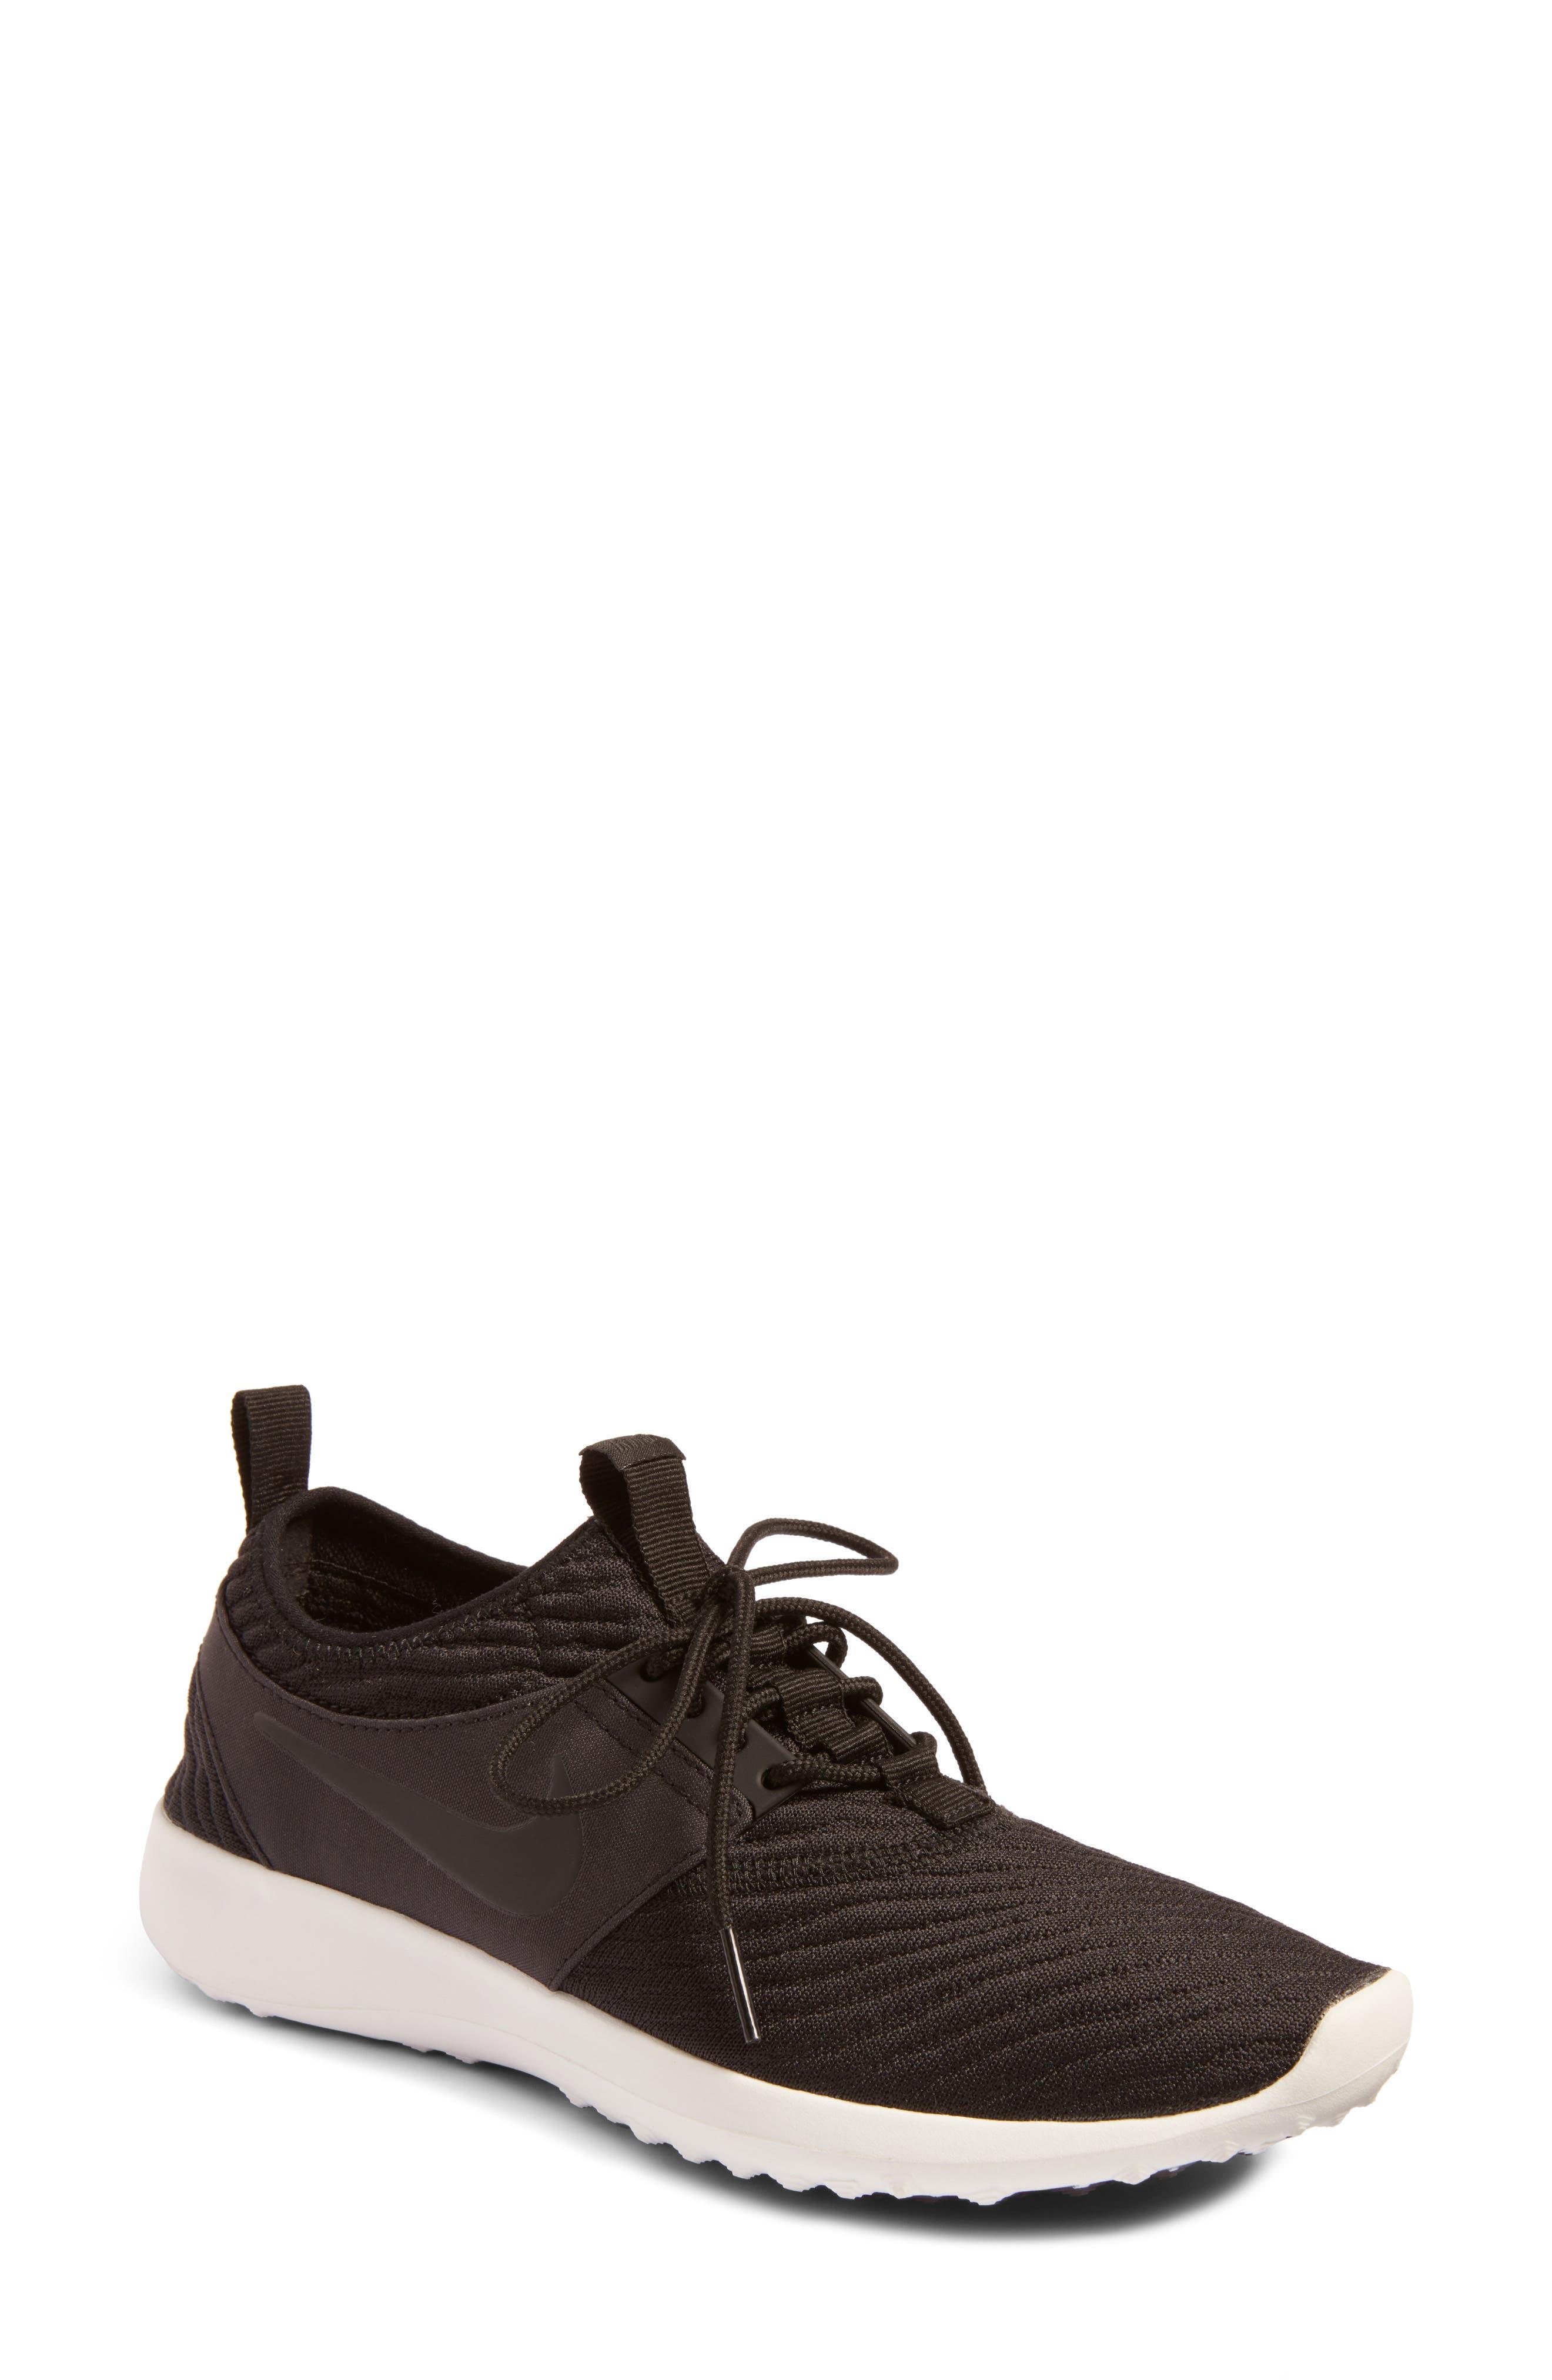 Juvenate SE Sneaker,                         Main,                         color, Black/ Summit White